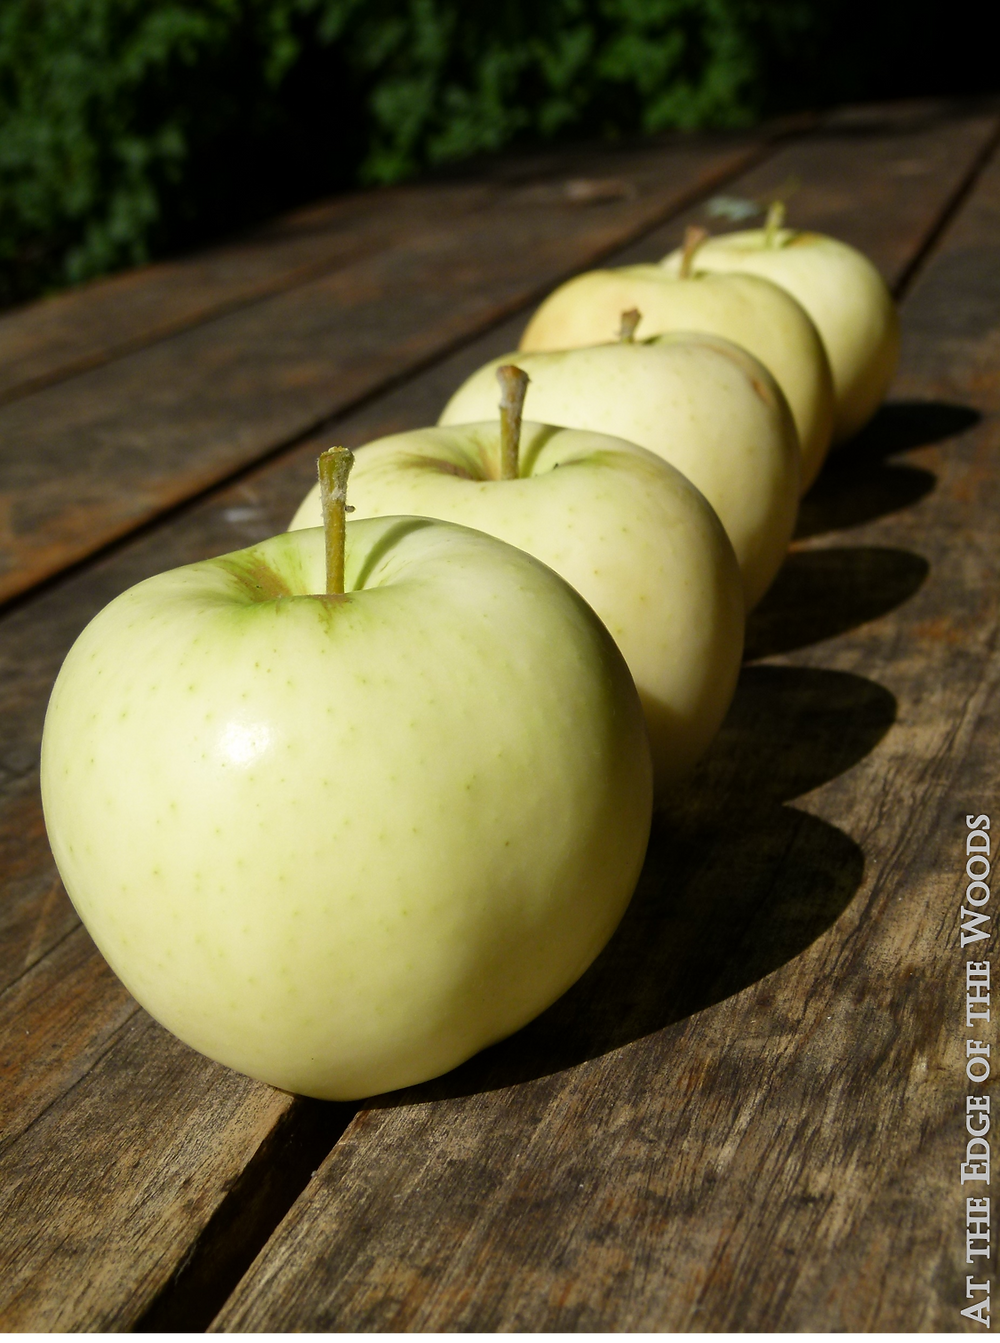 Yellow Transparent Apples